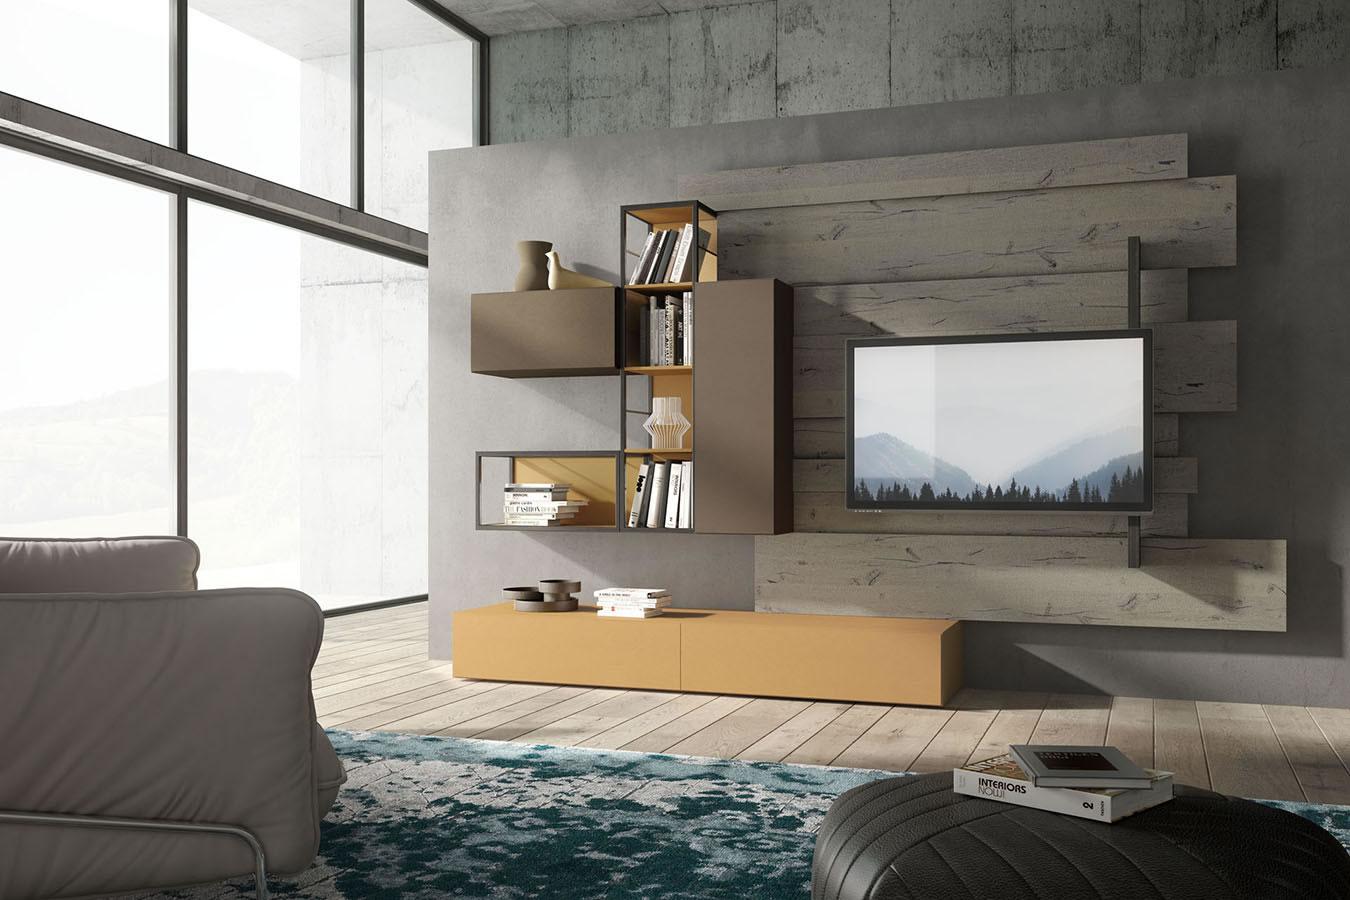 latest italian sofa designs bantam craigslist momentoitalia furniture blog news from the 2016